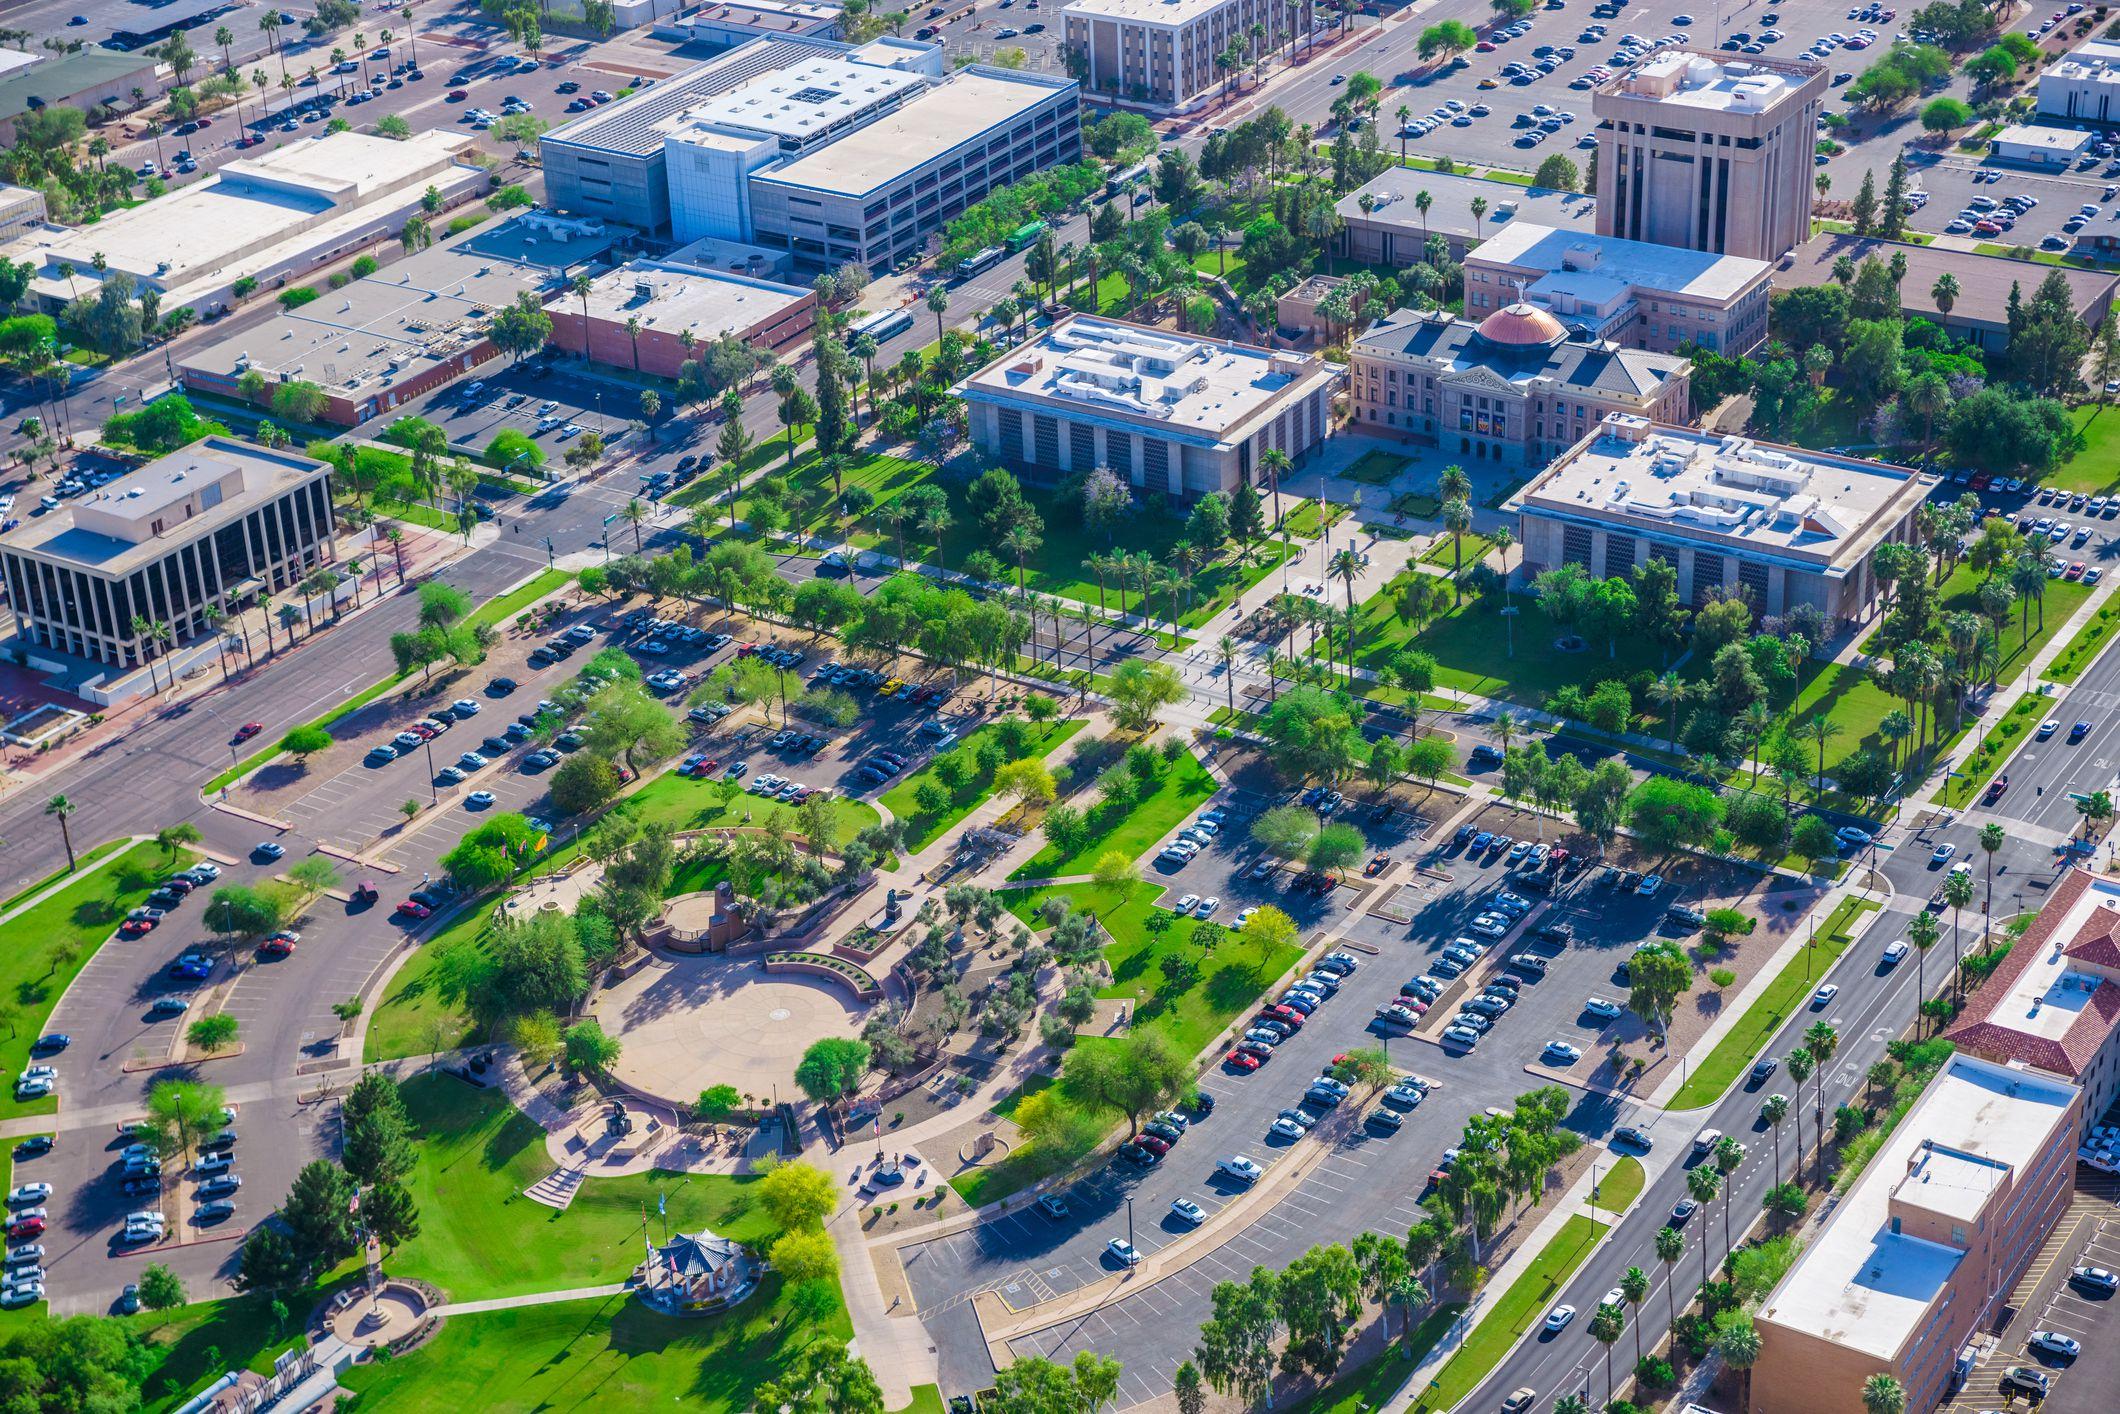 Arizona Capitol Building